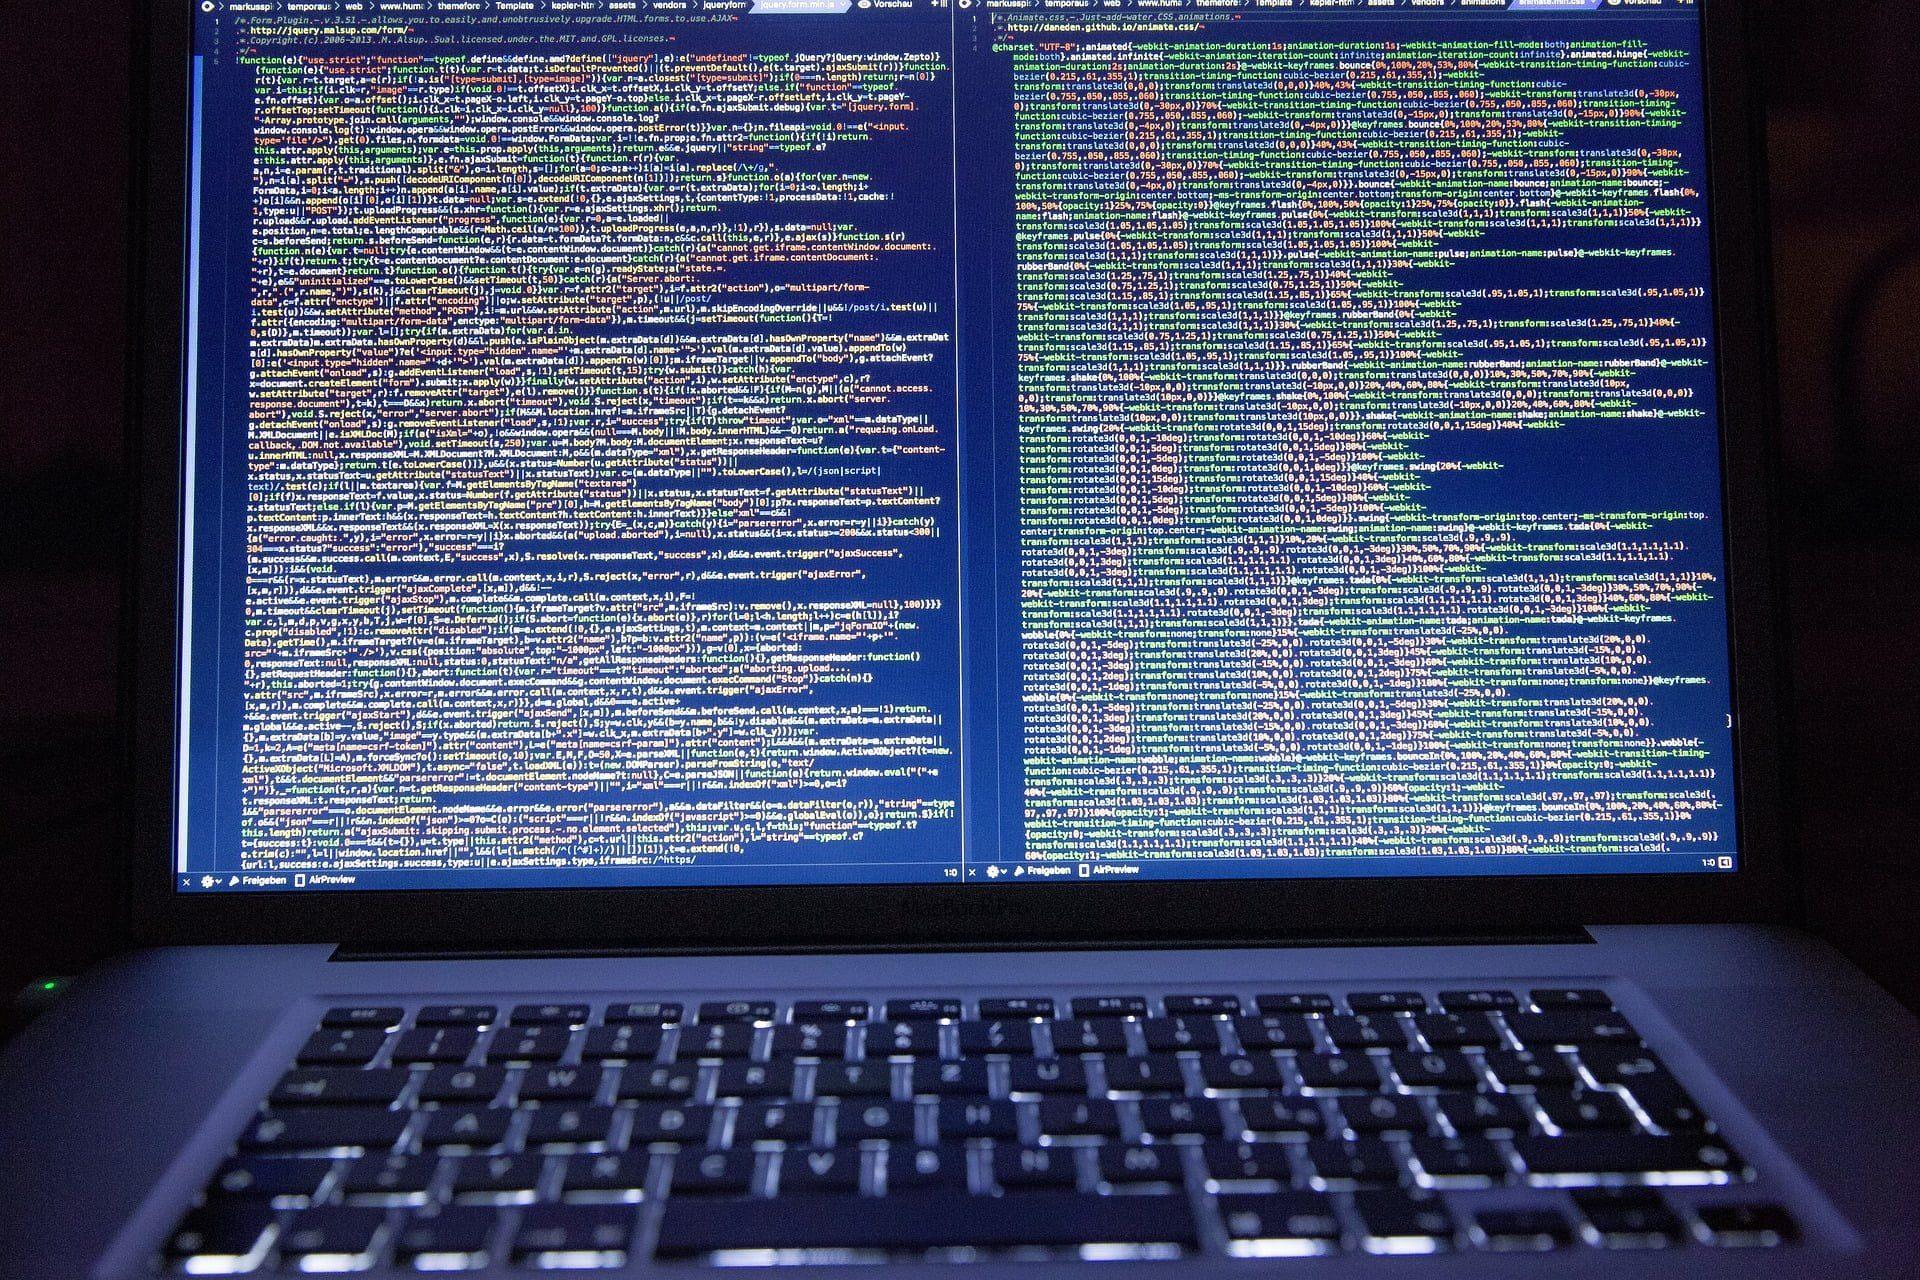 atacuri cibernetice prin email